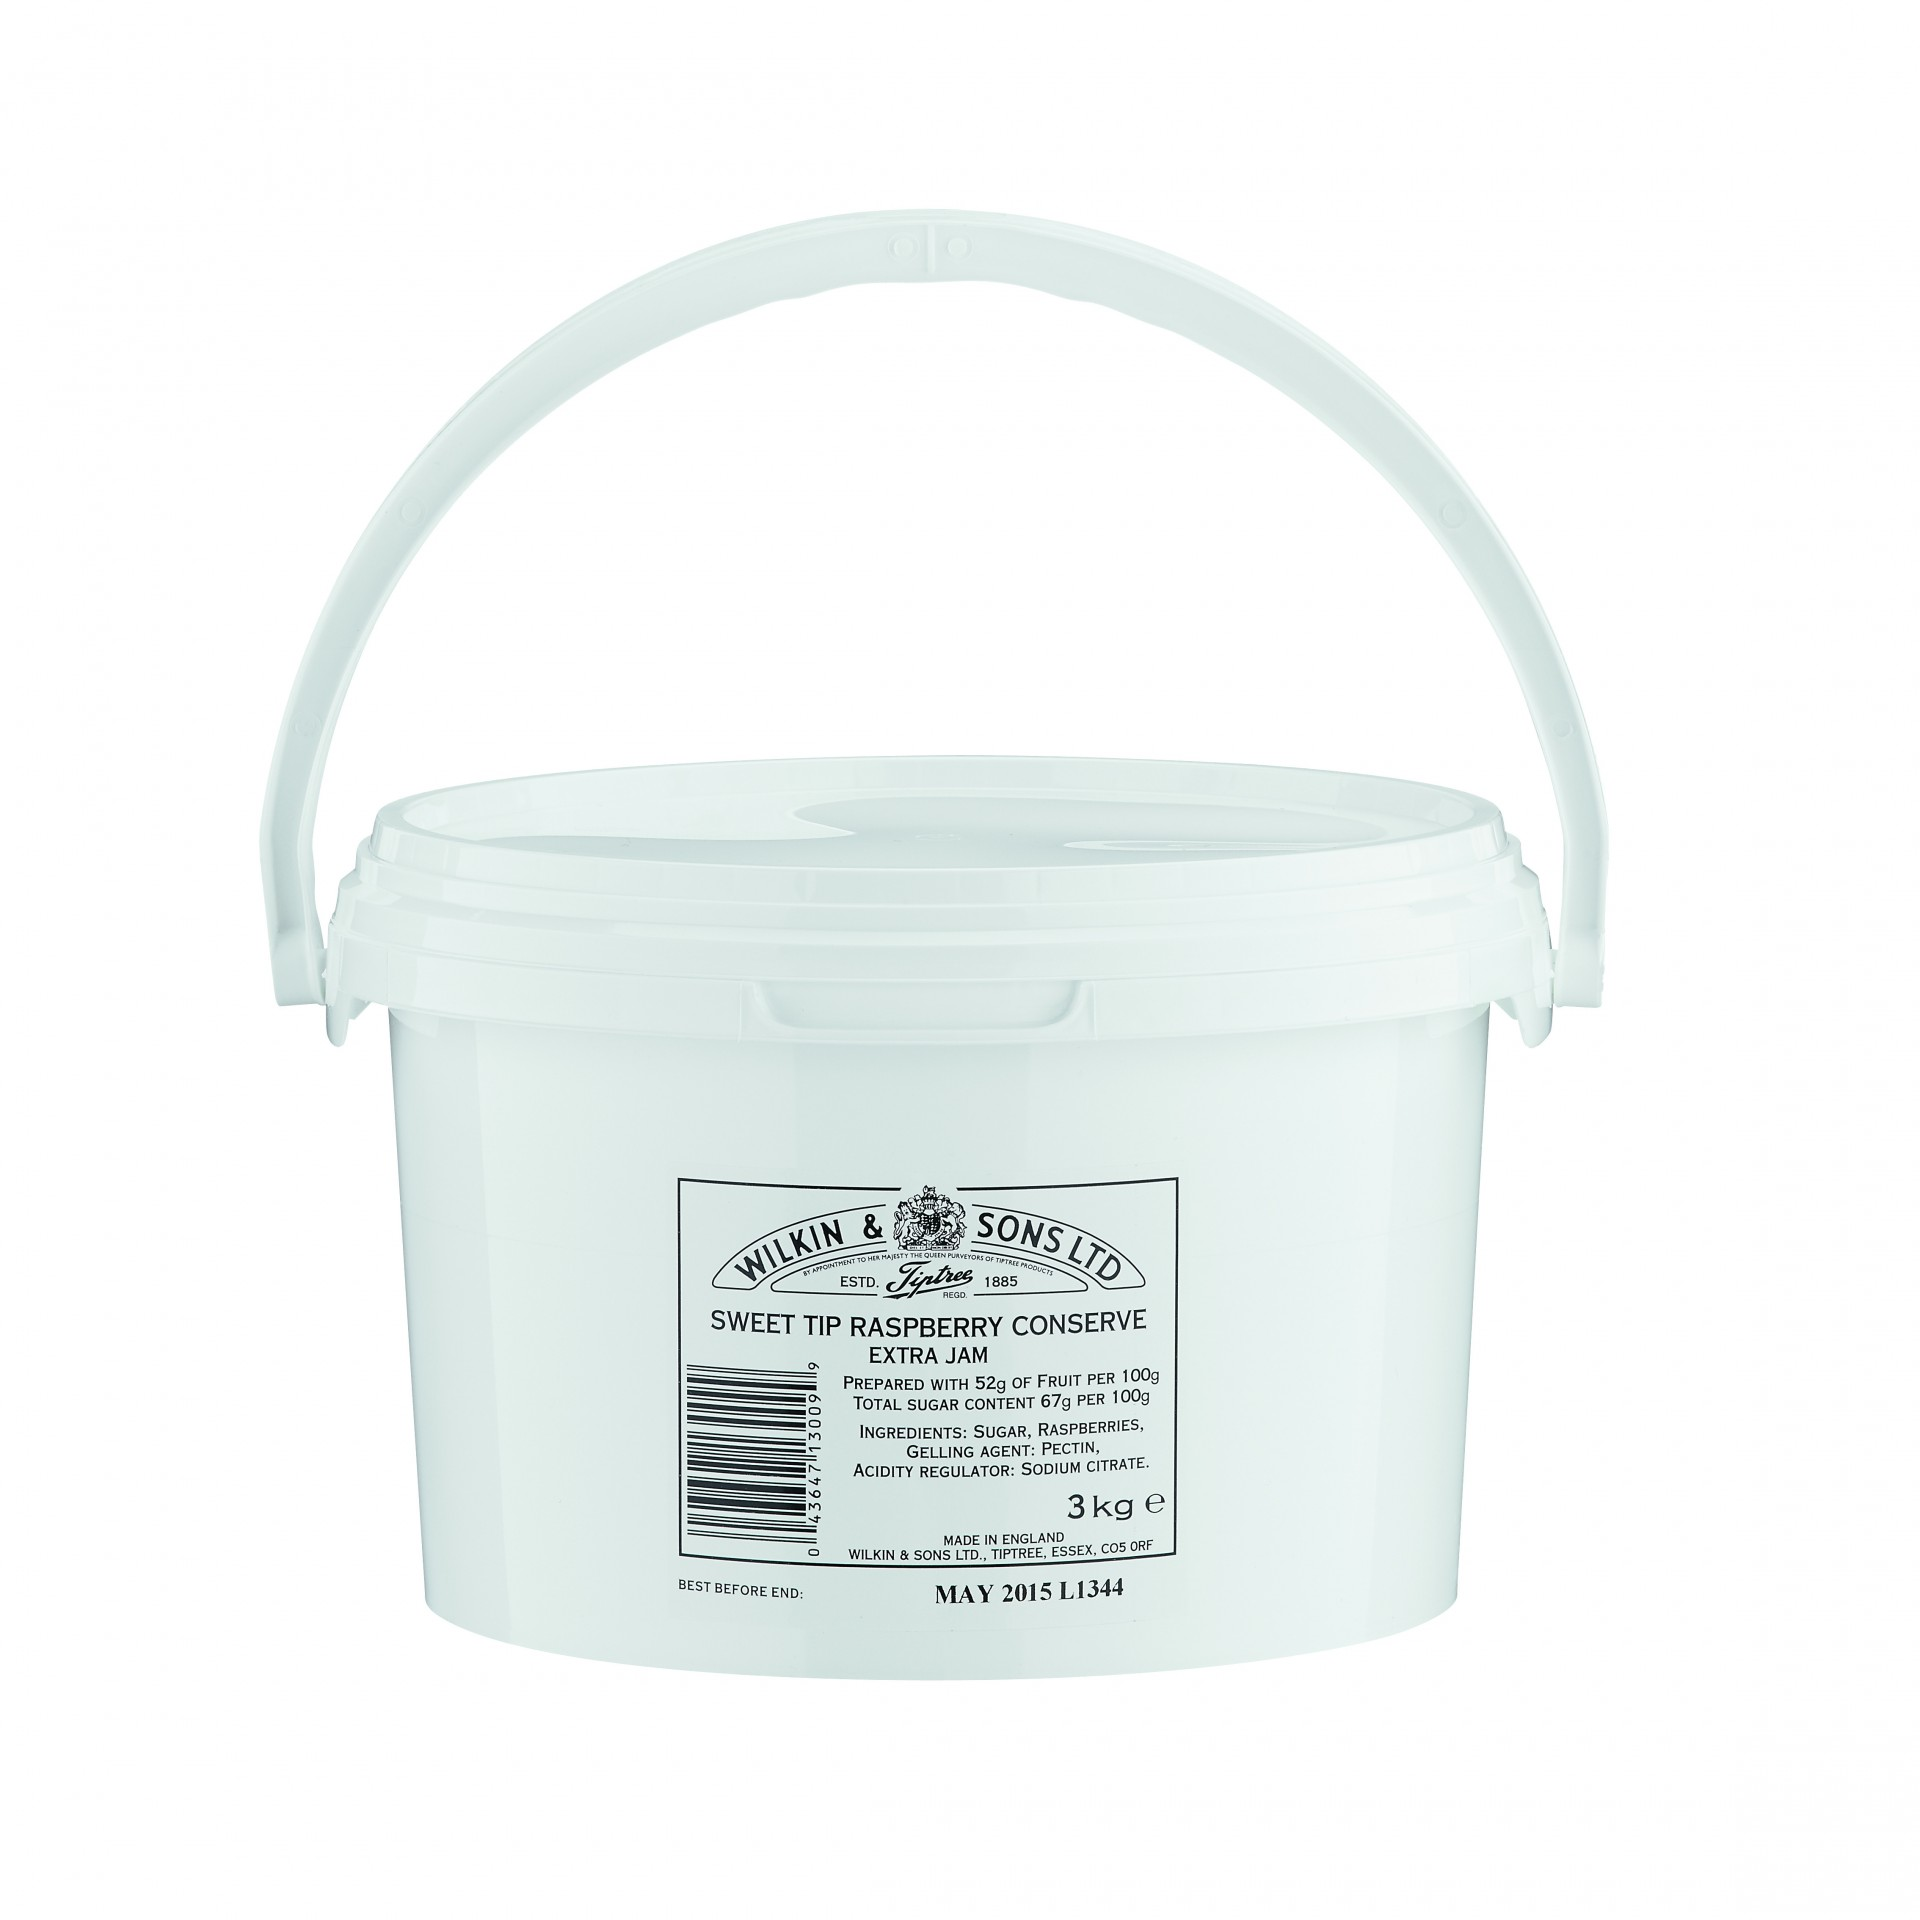 Tiptree Raspberry Preserve 3kg